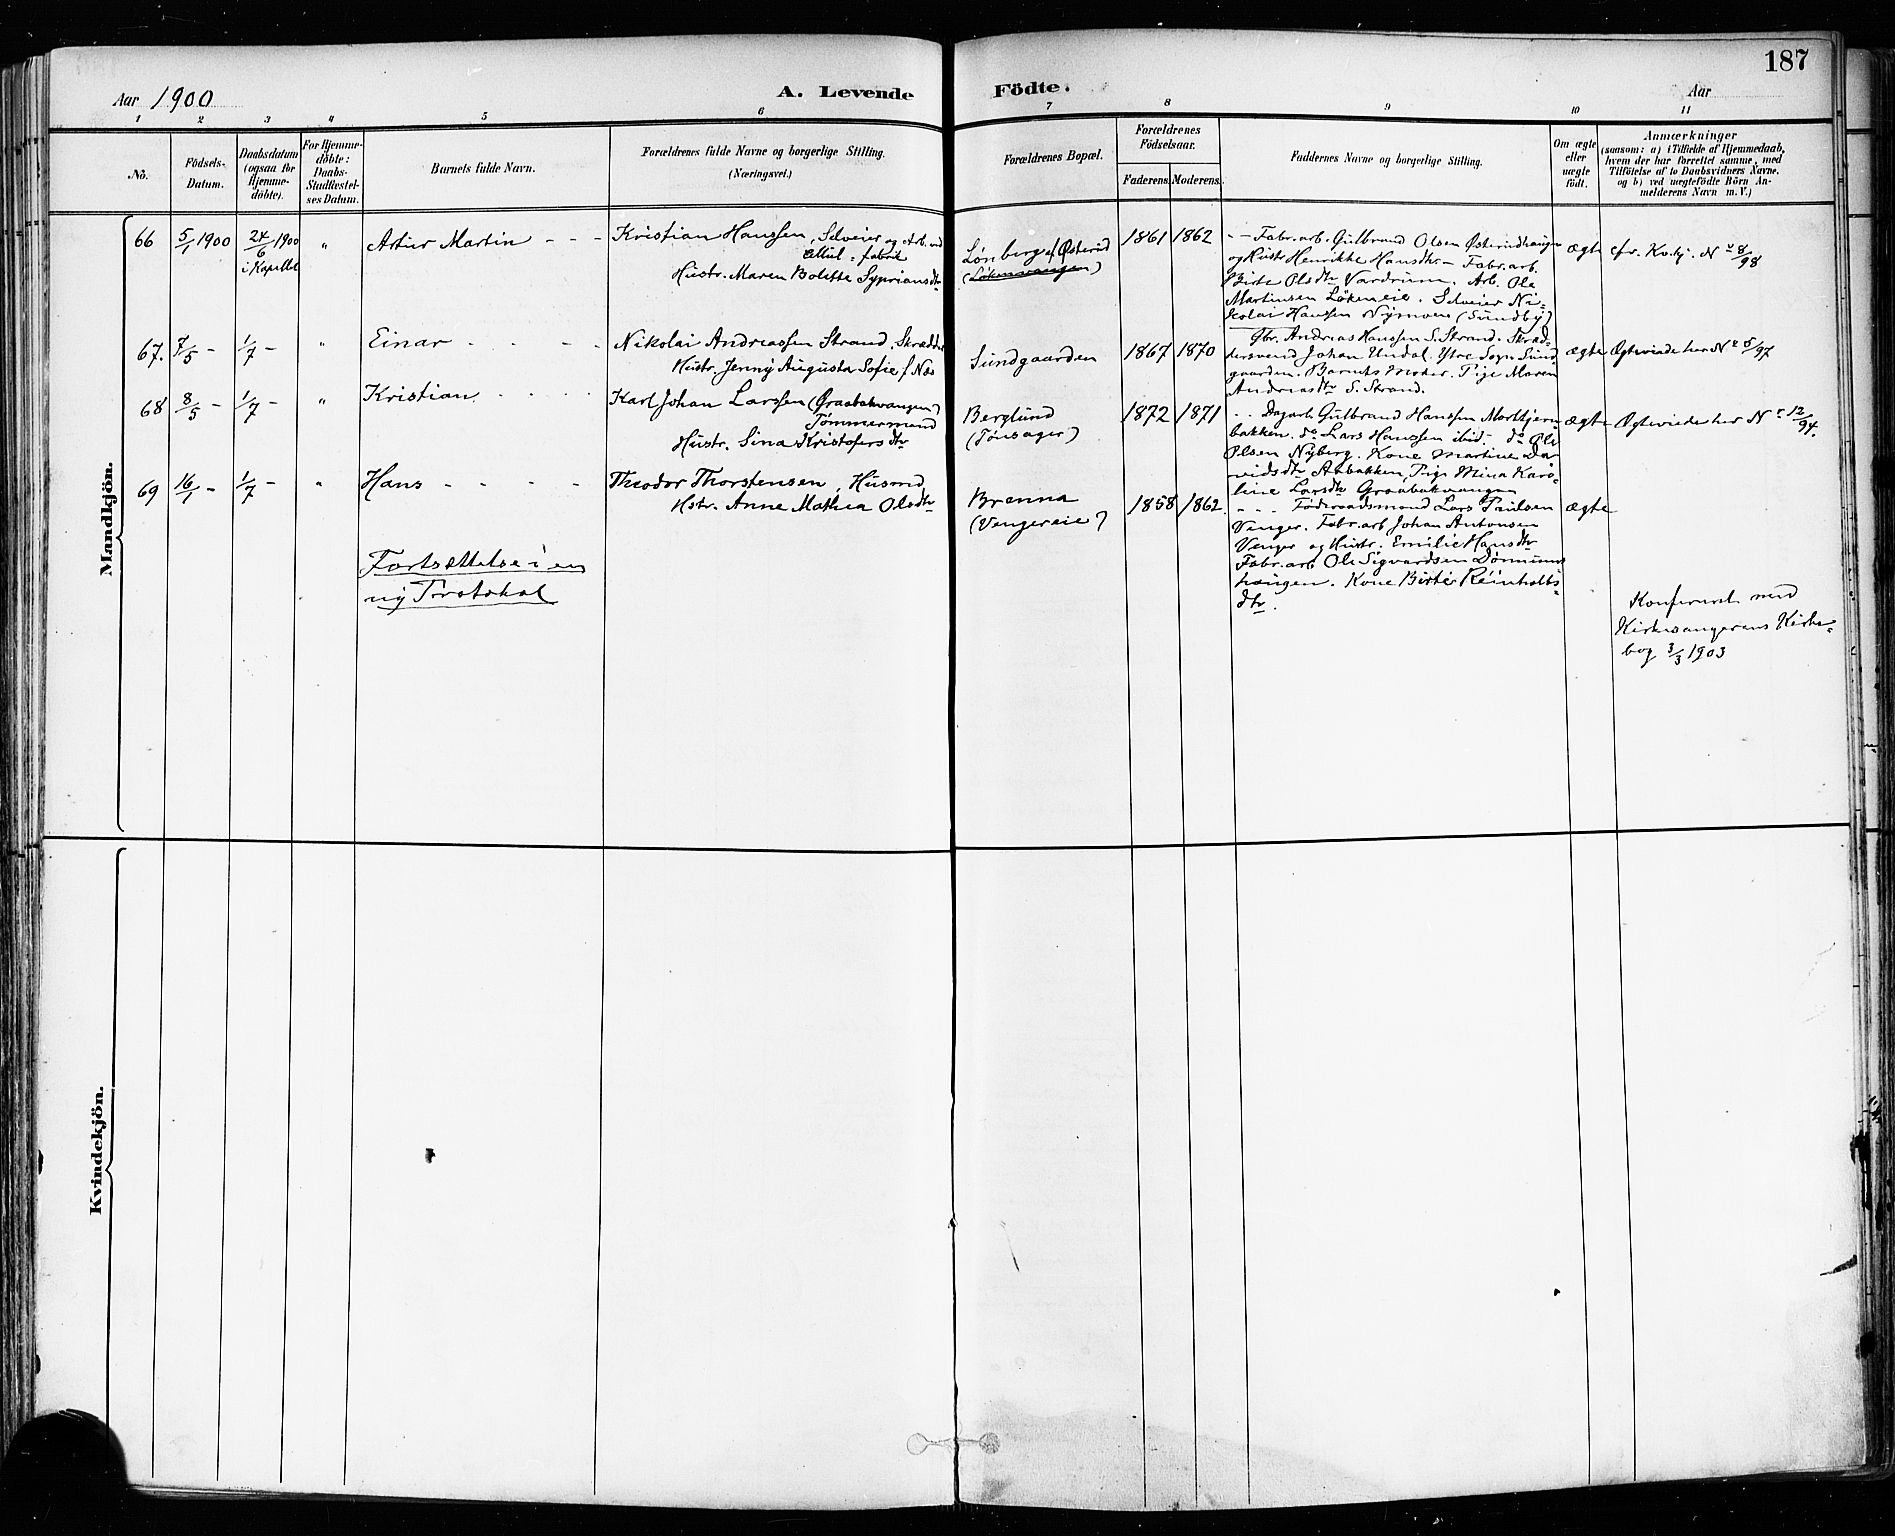 SAO, Eidsvoll prestekontor Kirkebøker, F/Fa/L0004: Ministerialbok nr. I 4, 1891-1900, s. 187